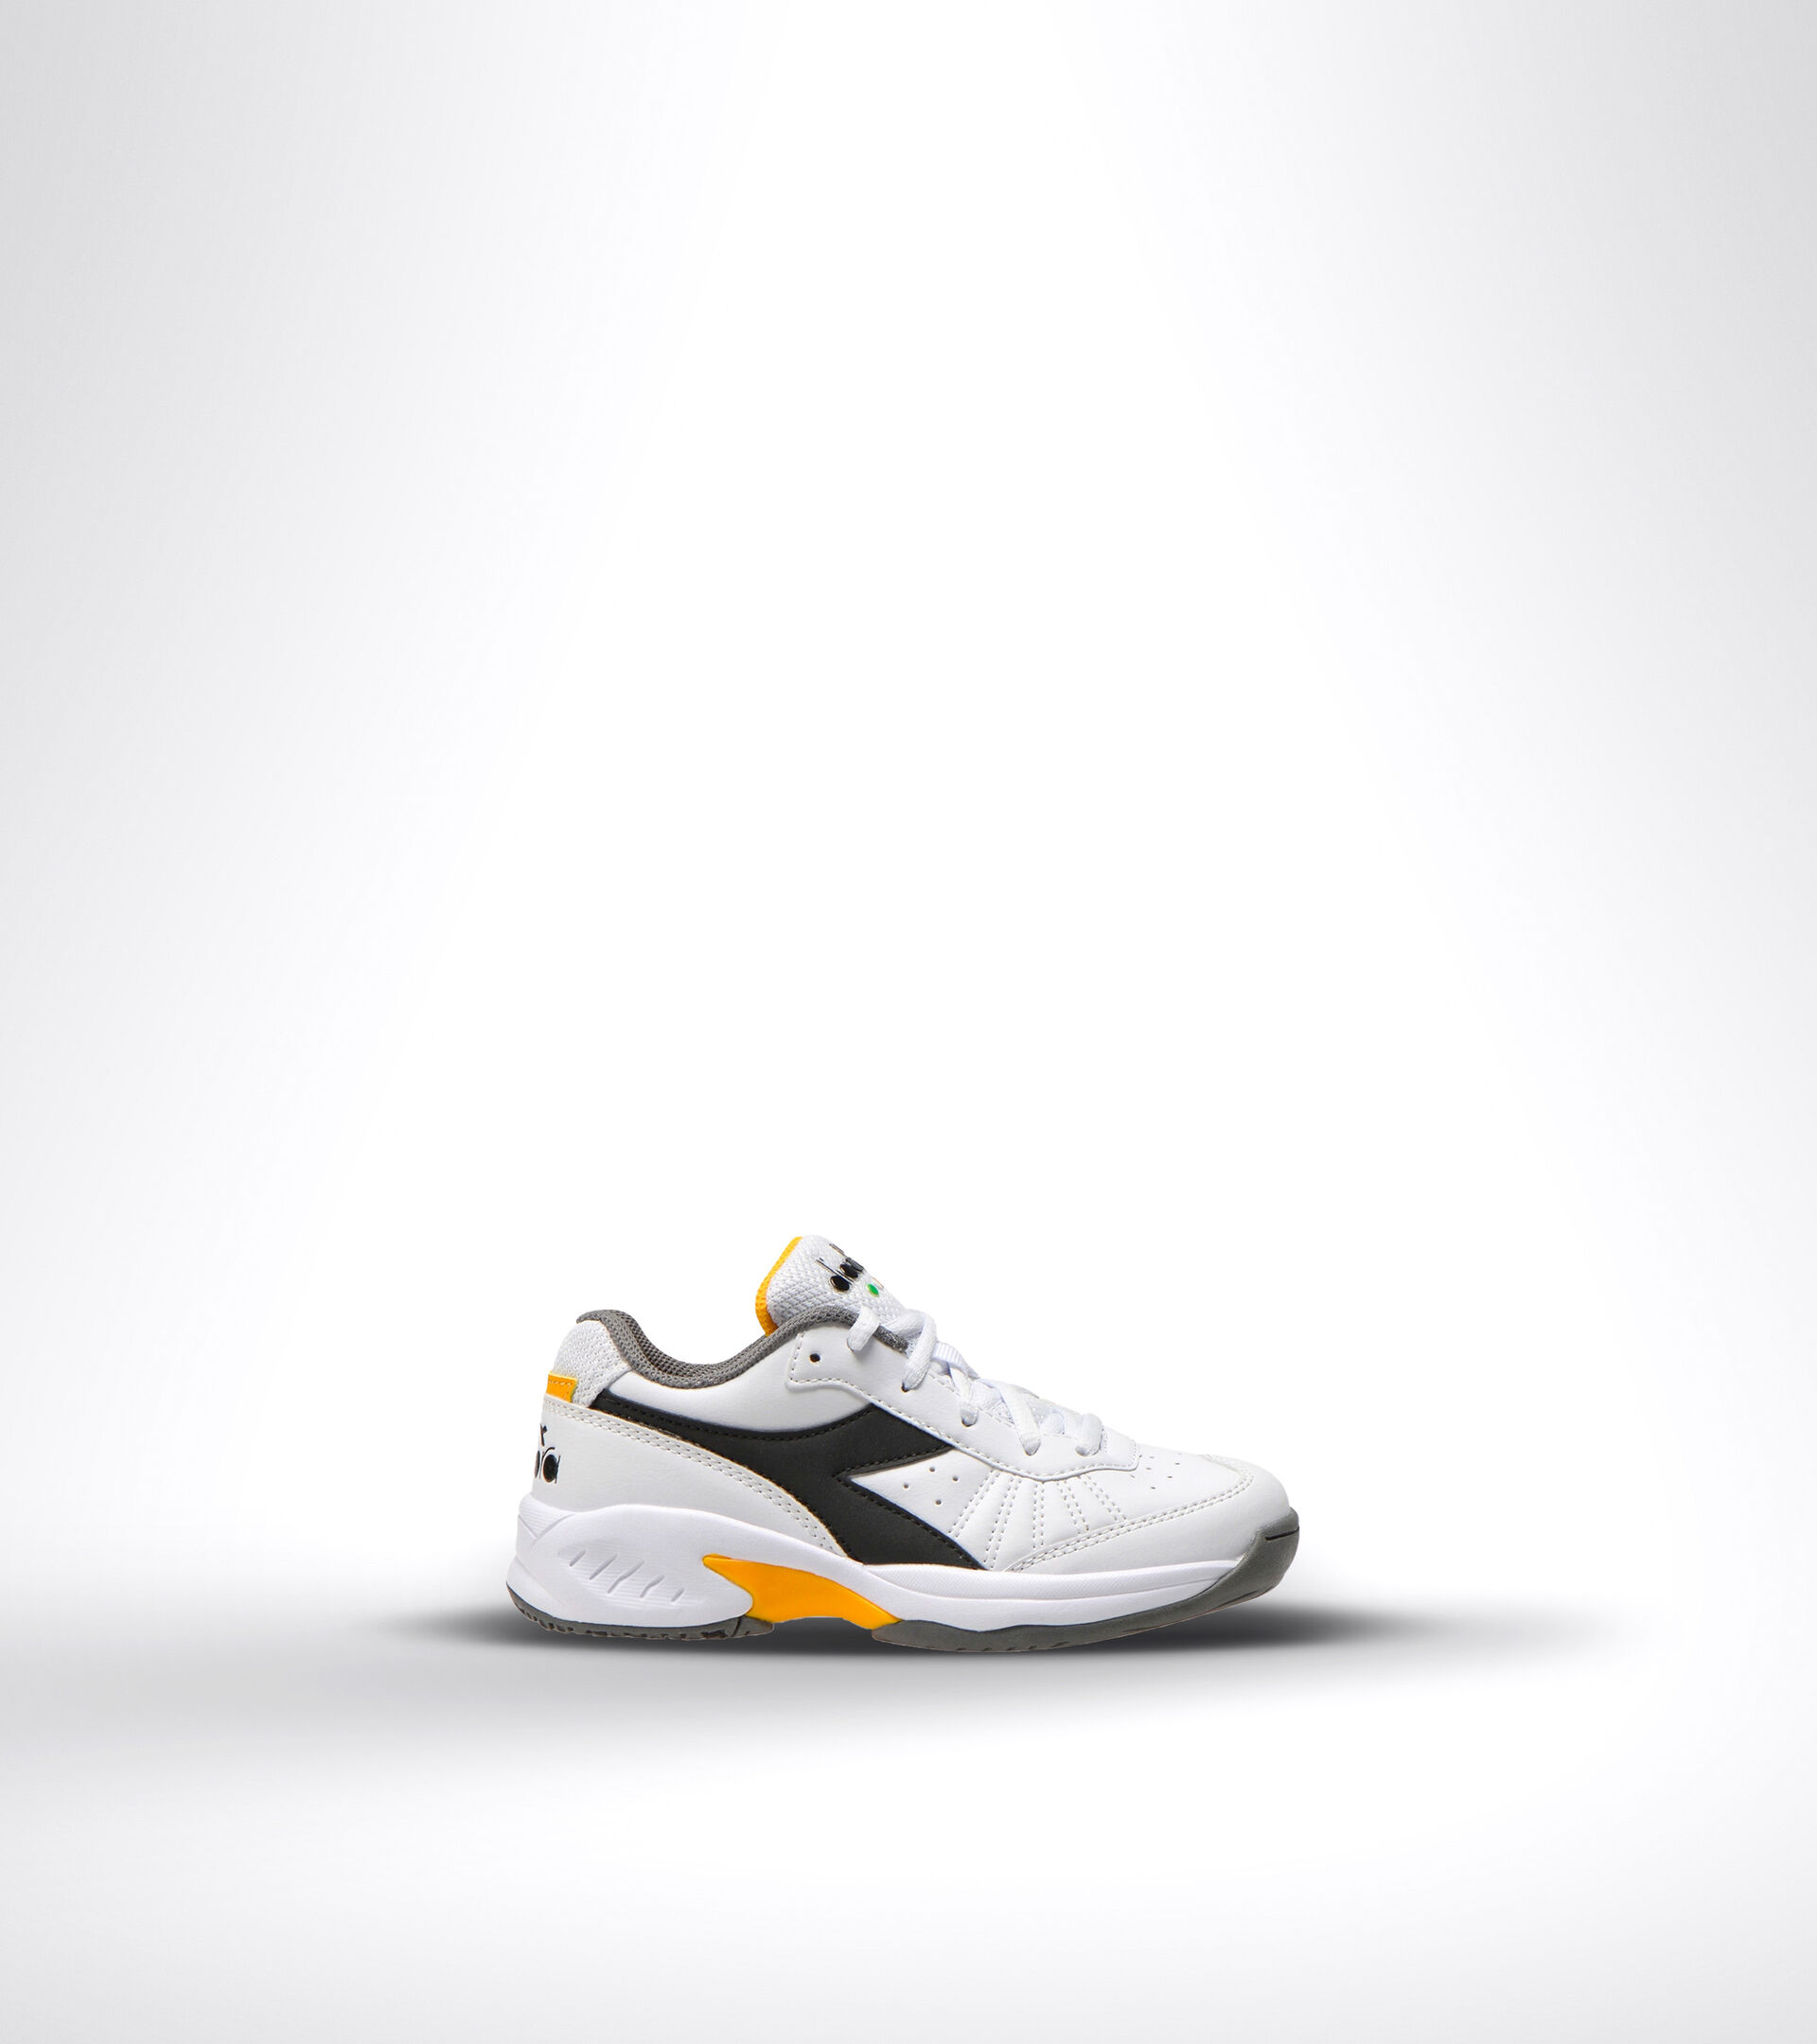 Footwear Sport BAMBINO S. CHALLENGE 3 SL JR WHITE/BLACK/SAFFRON Diadora